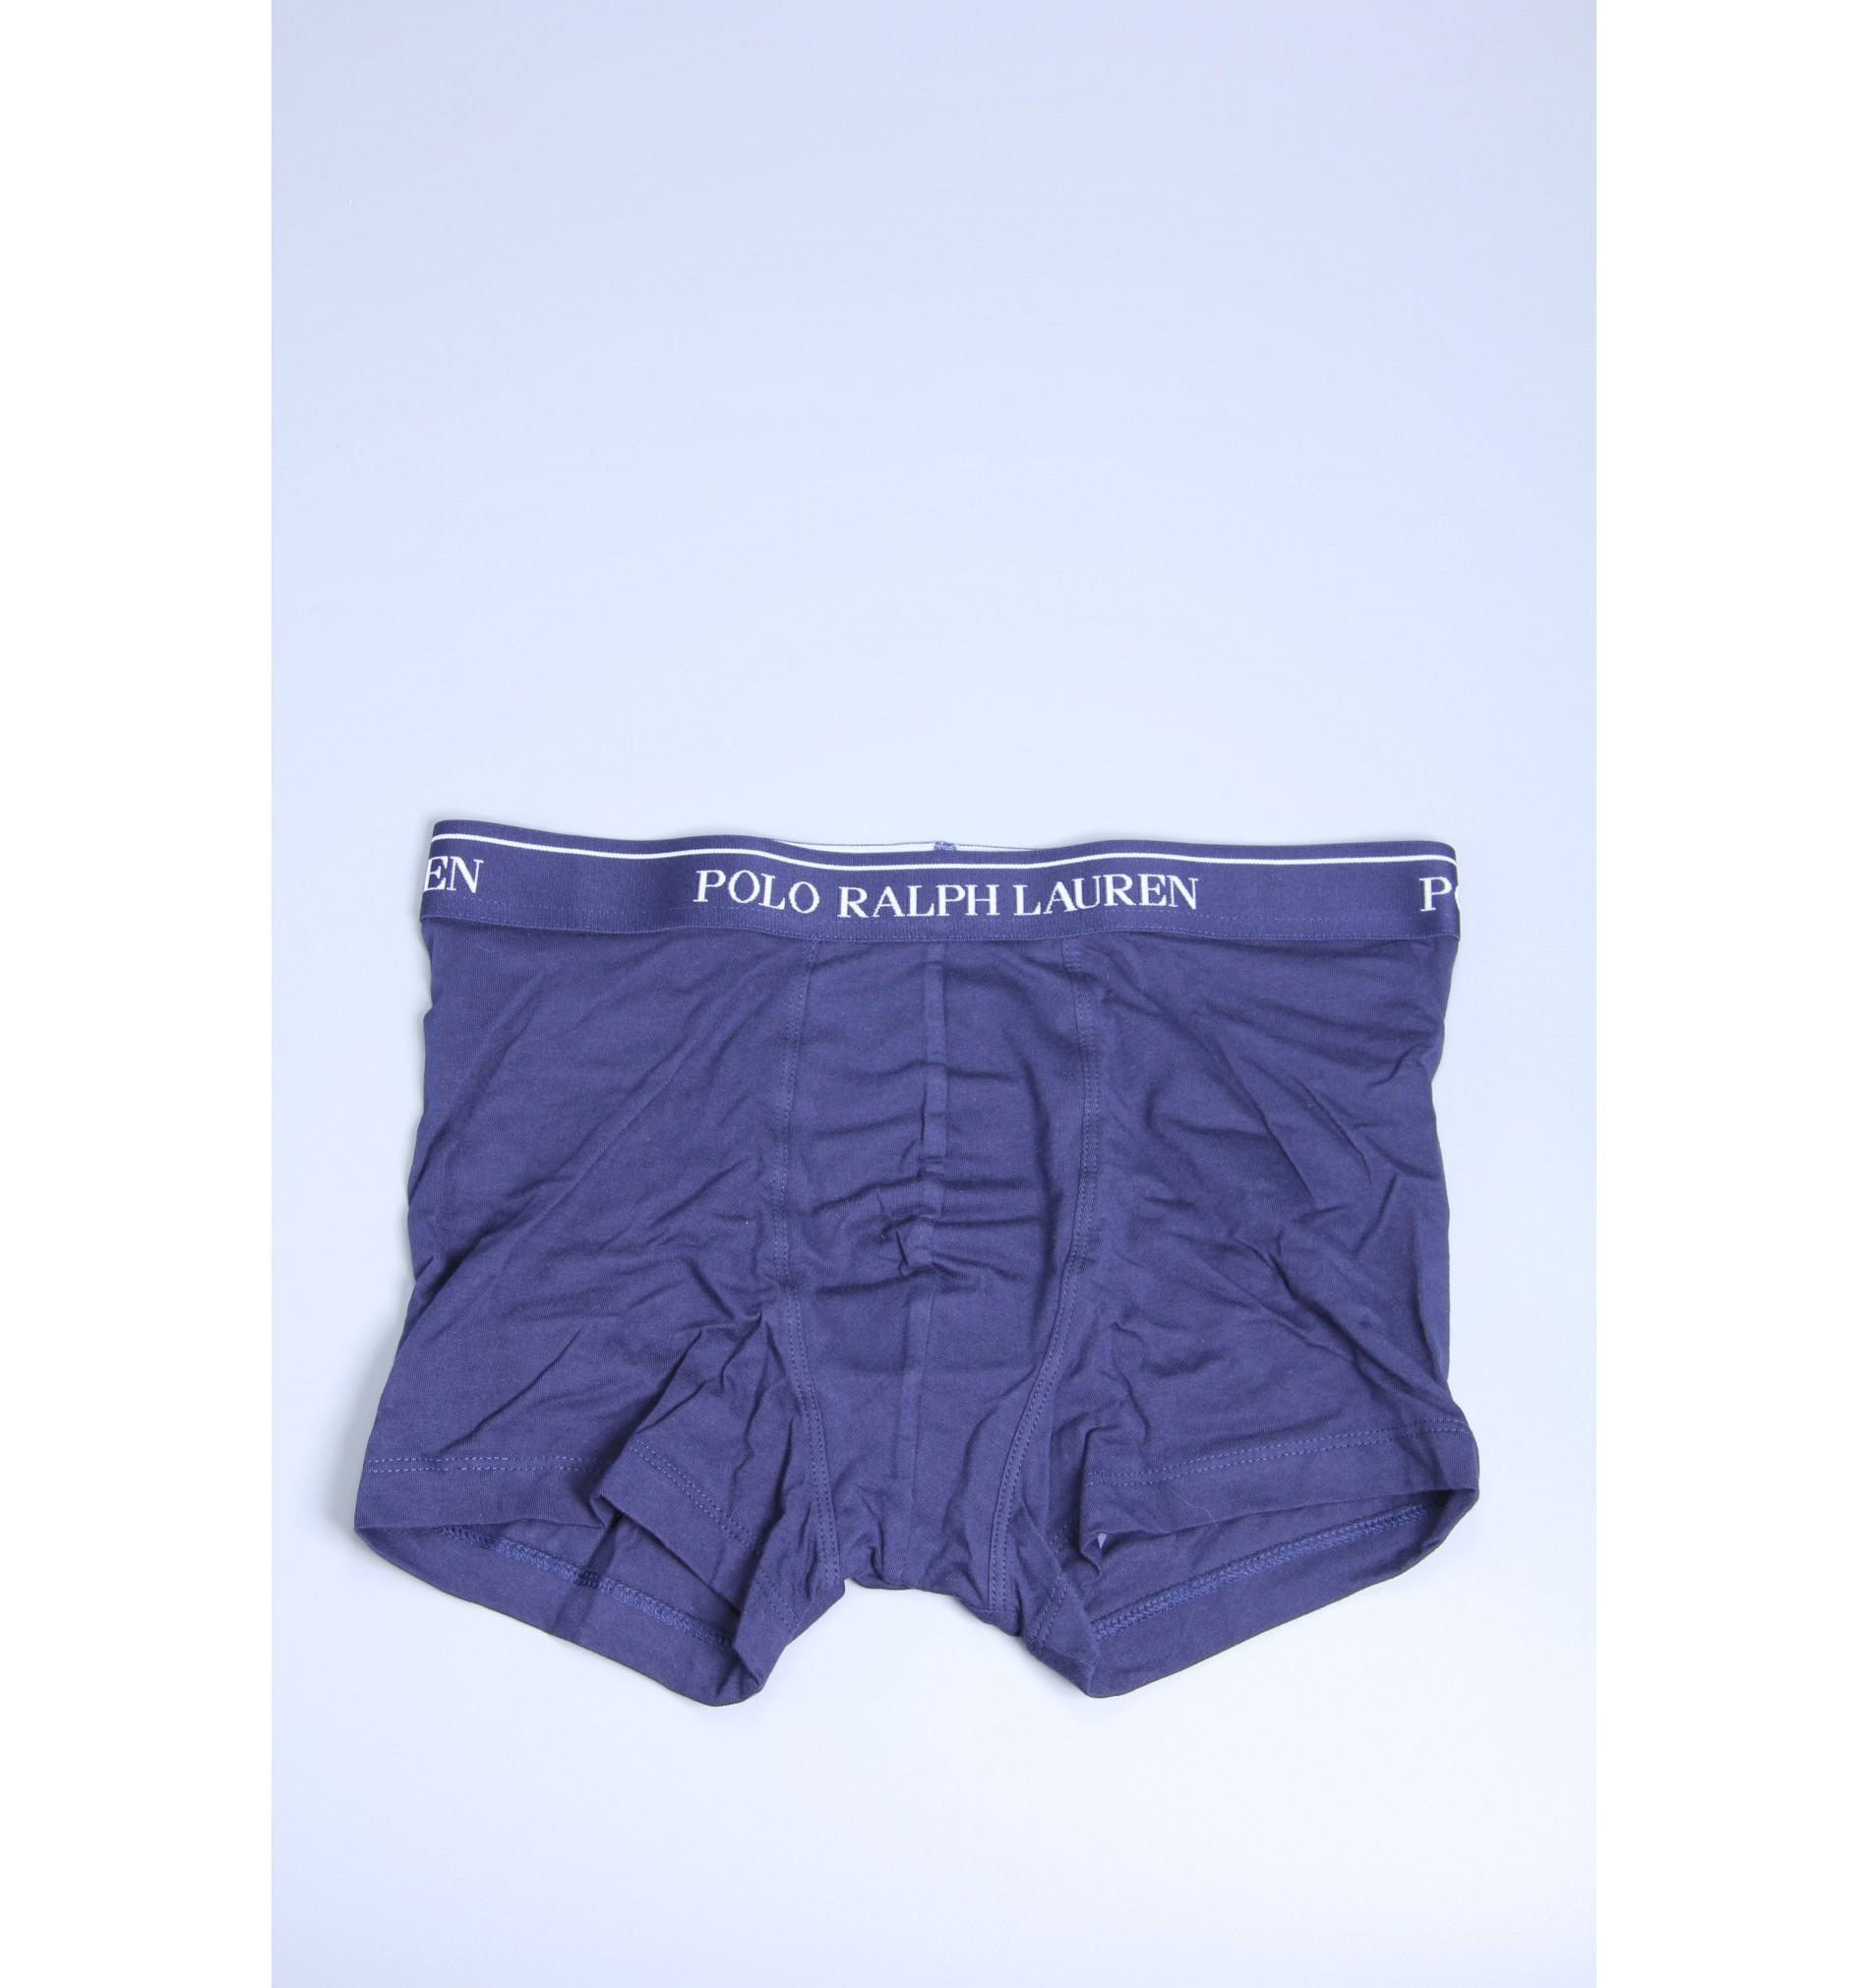 Polo boxerky '714621926-006' tmavo-modré  006